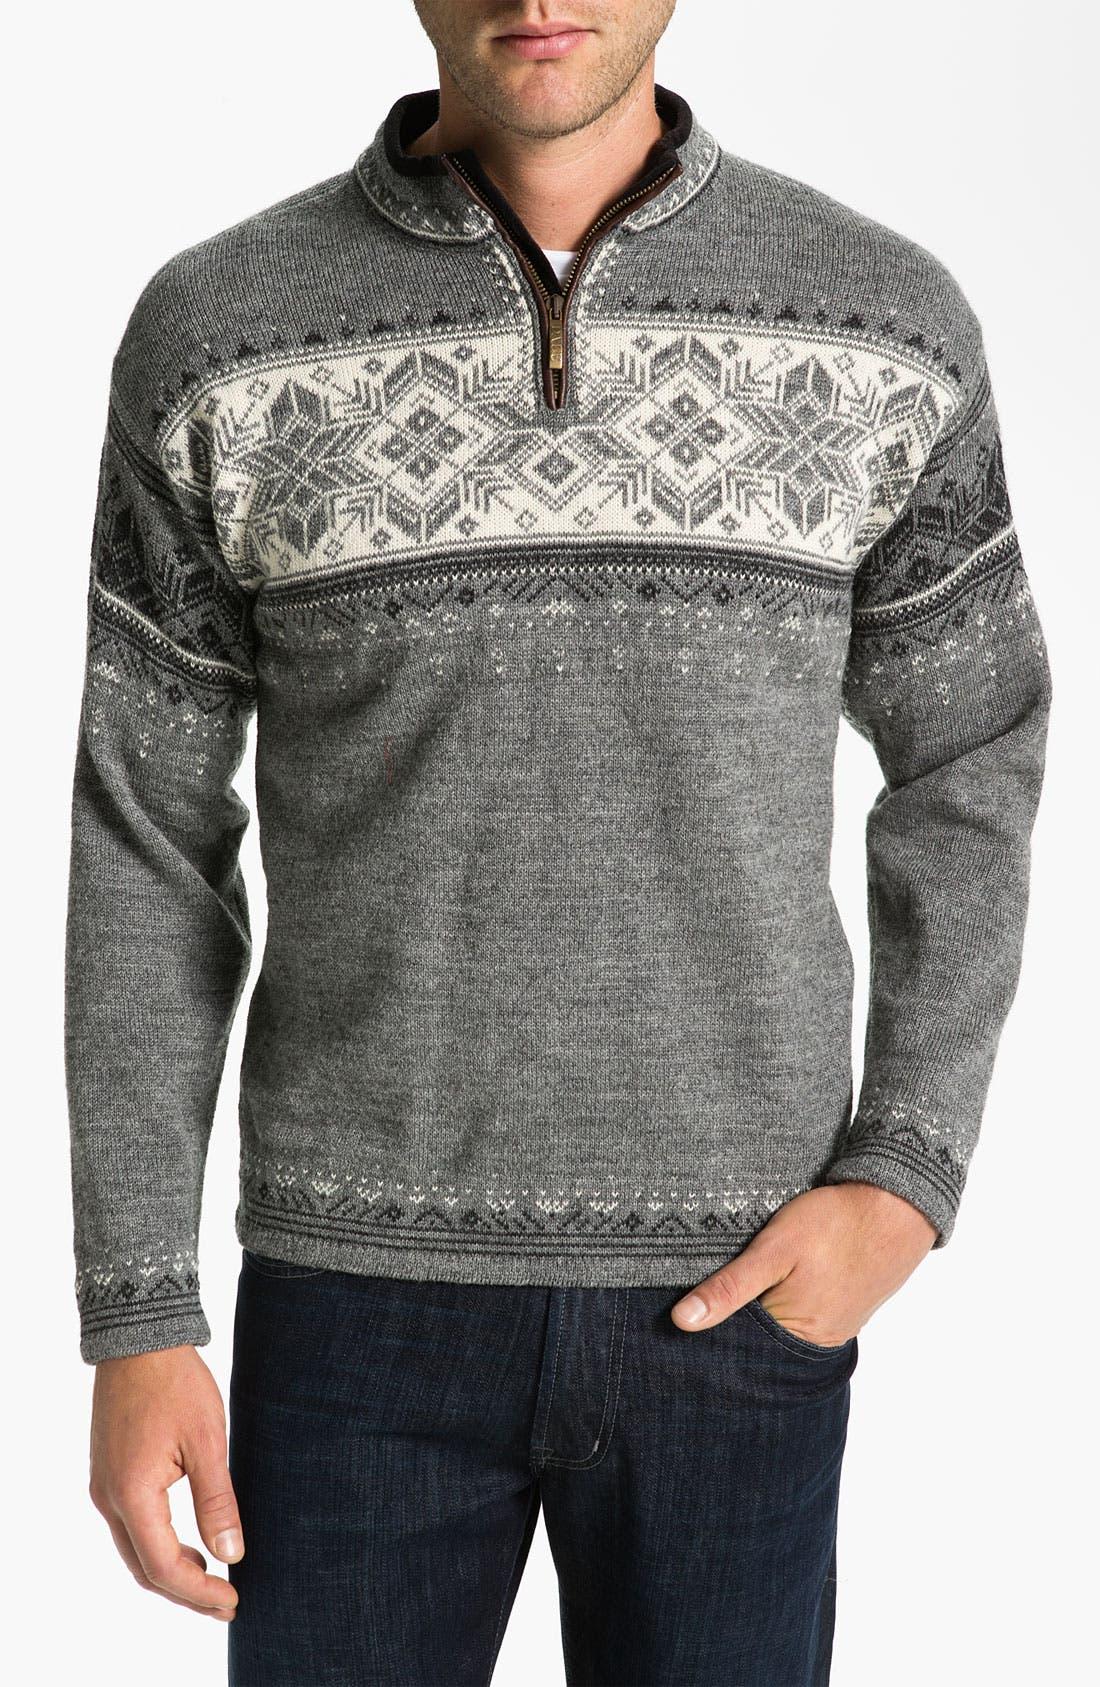 Main Image - Dale of Norway 'Blyfjell' Quarter Zip Wool Sweater